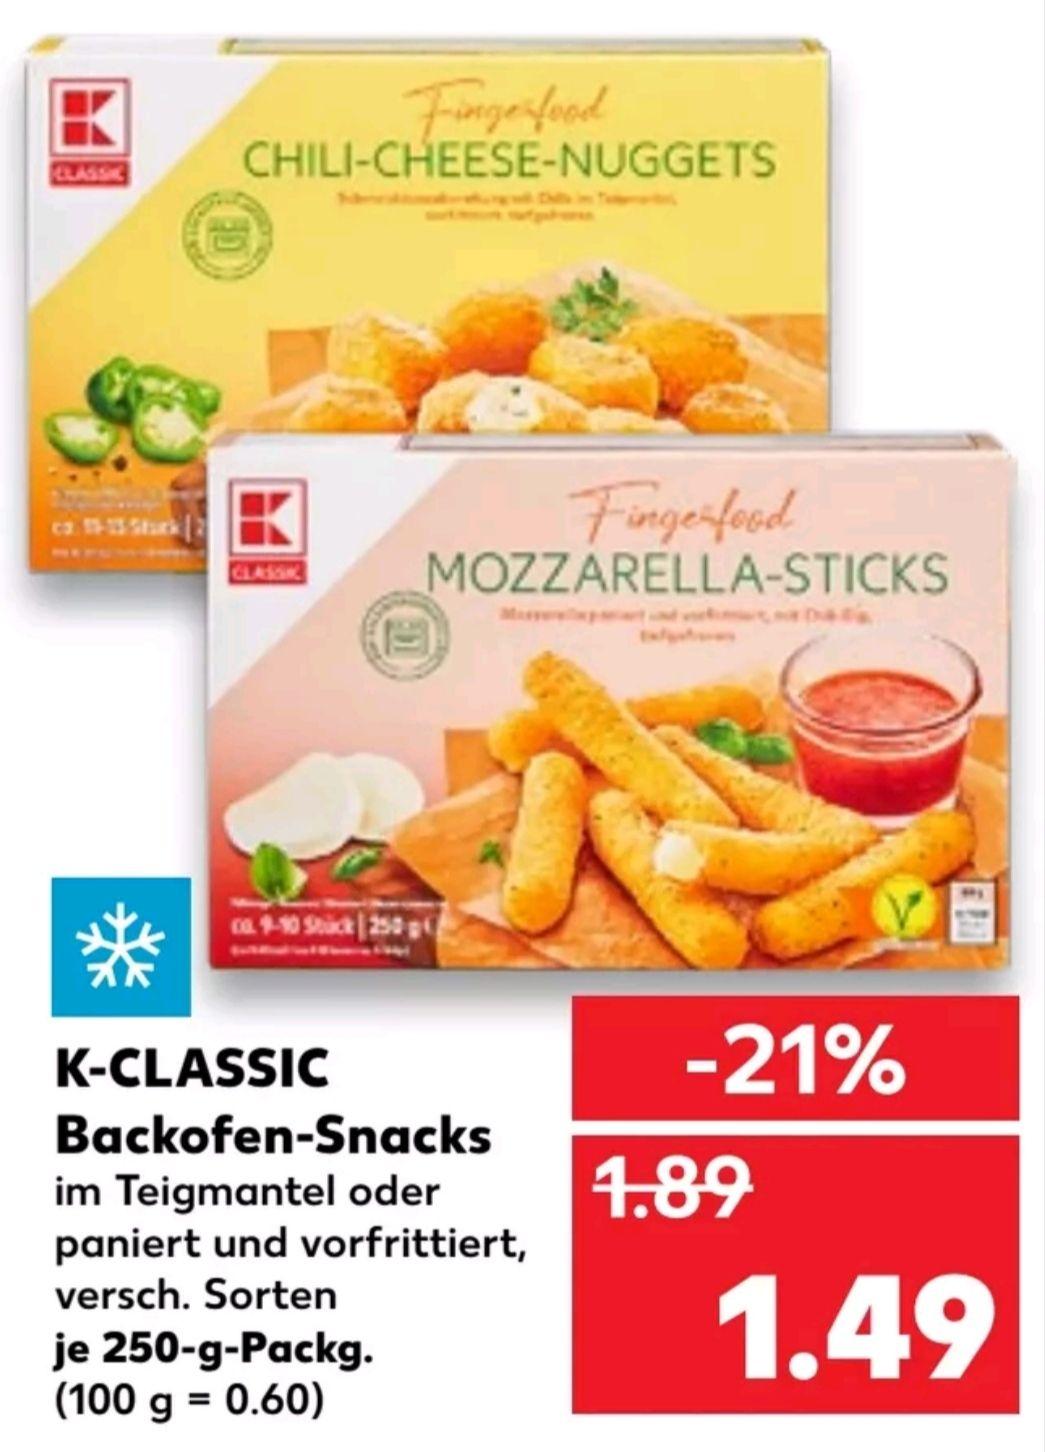 [Kaufland ab 26.04] K-Classic Backofen Snacks z.b. Chili Cheese Nuggets, Mozzarella Sticks für 1,49€